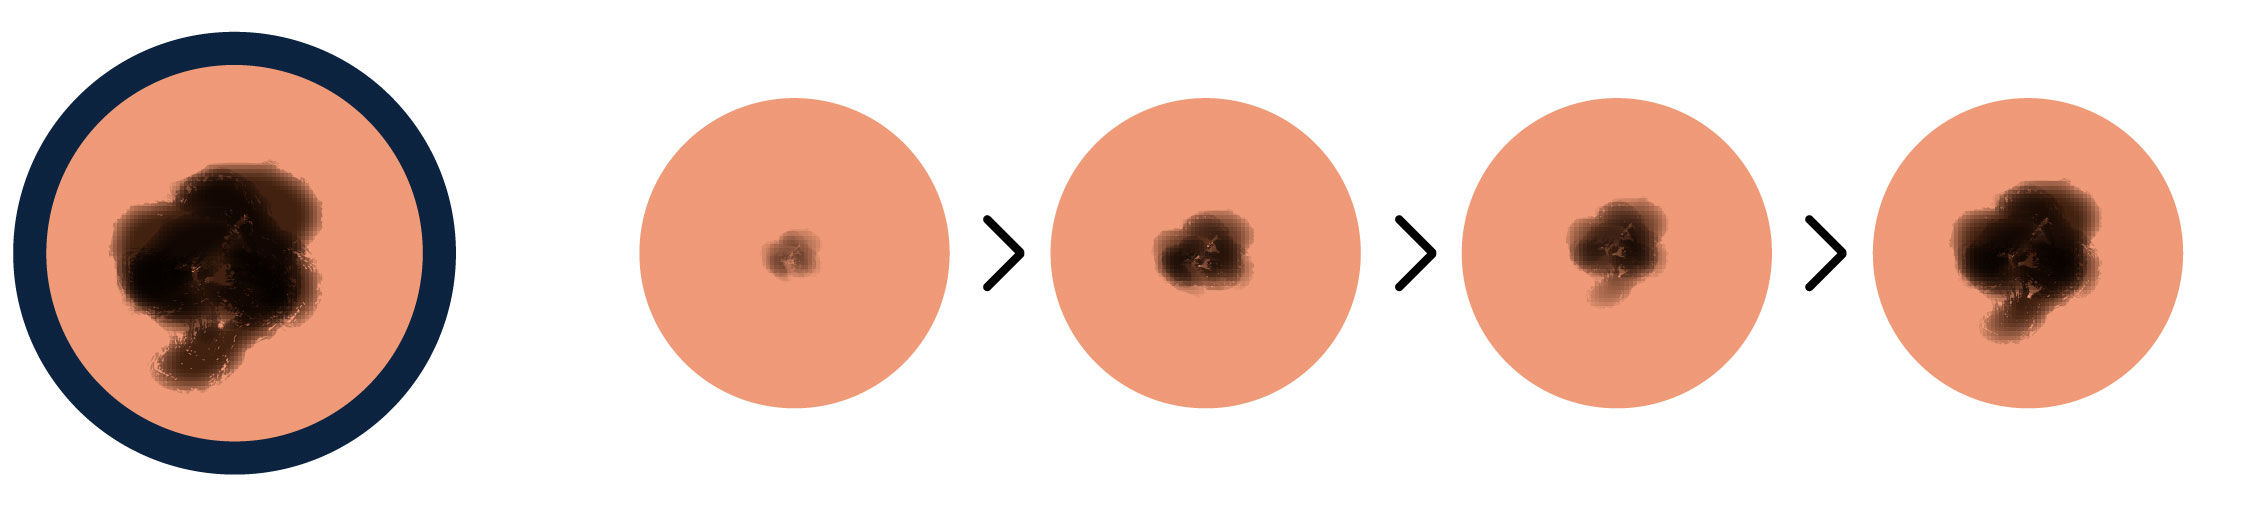 Illustration of evolving